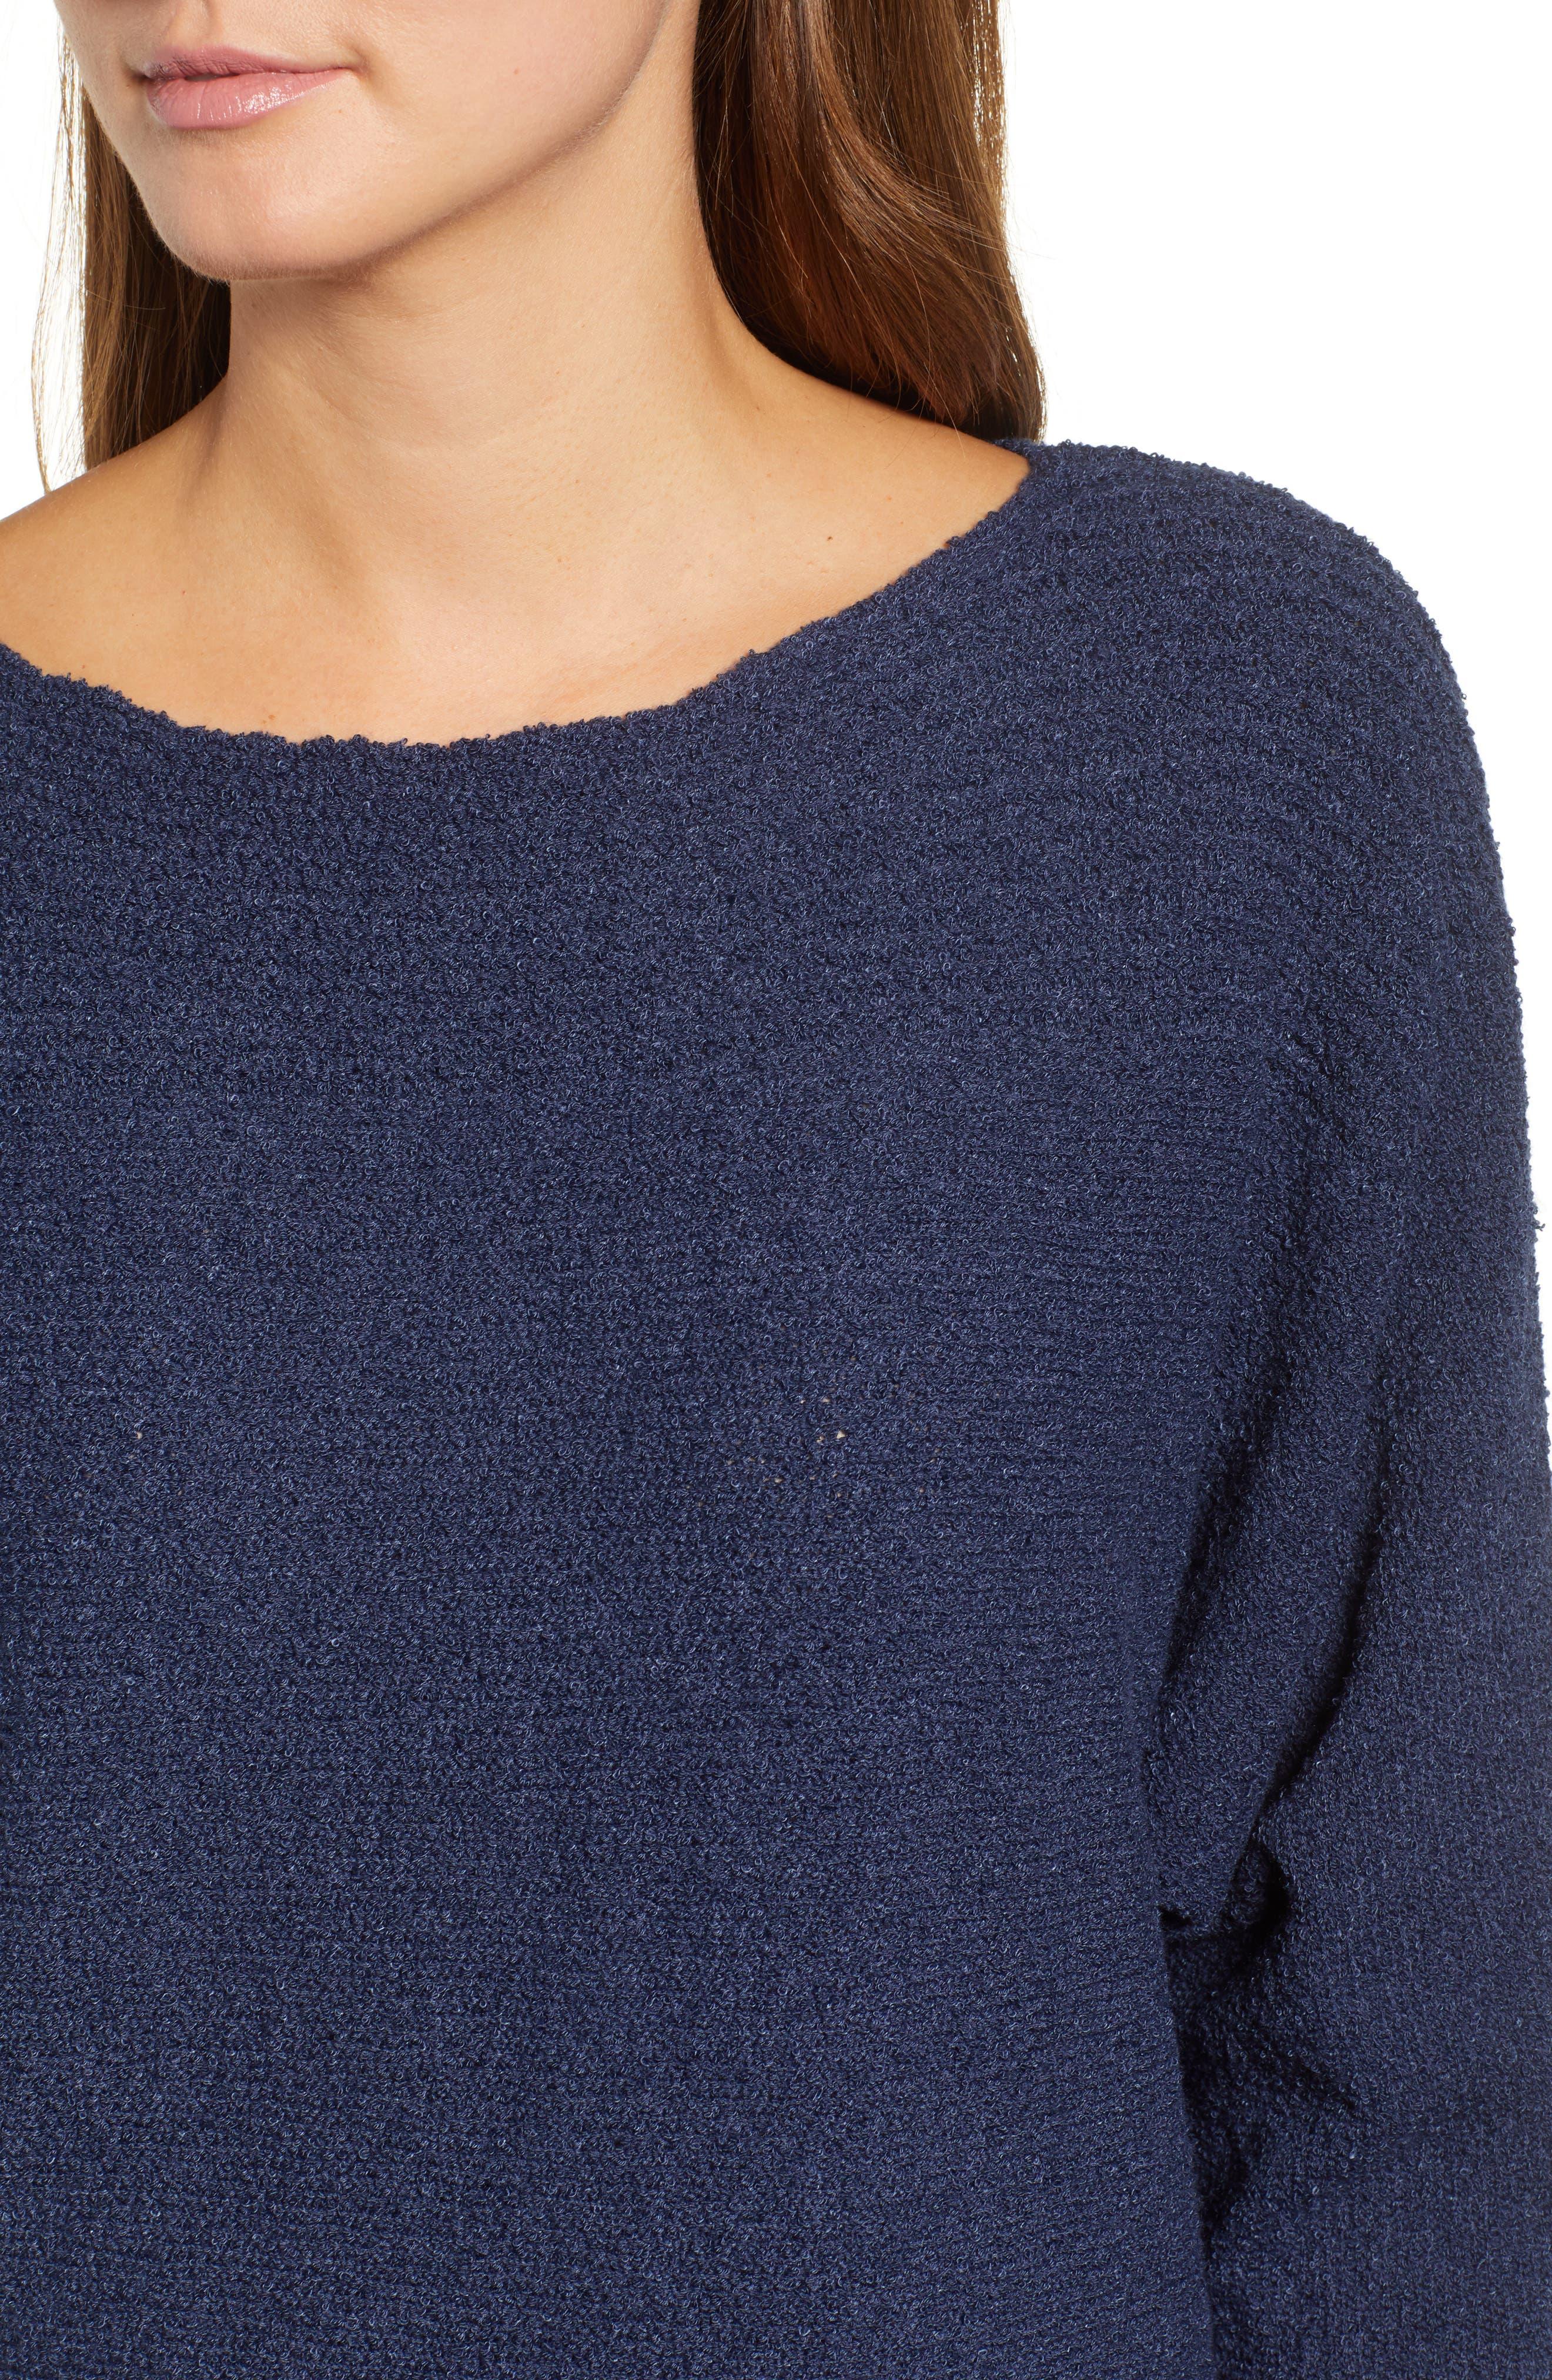 Calson<sup>®</sup> Dolman Sleeve Sweater,                             Alternate thumbnail 4, color,                             Navy Indigo